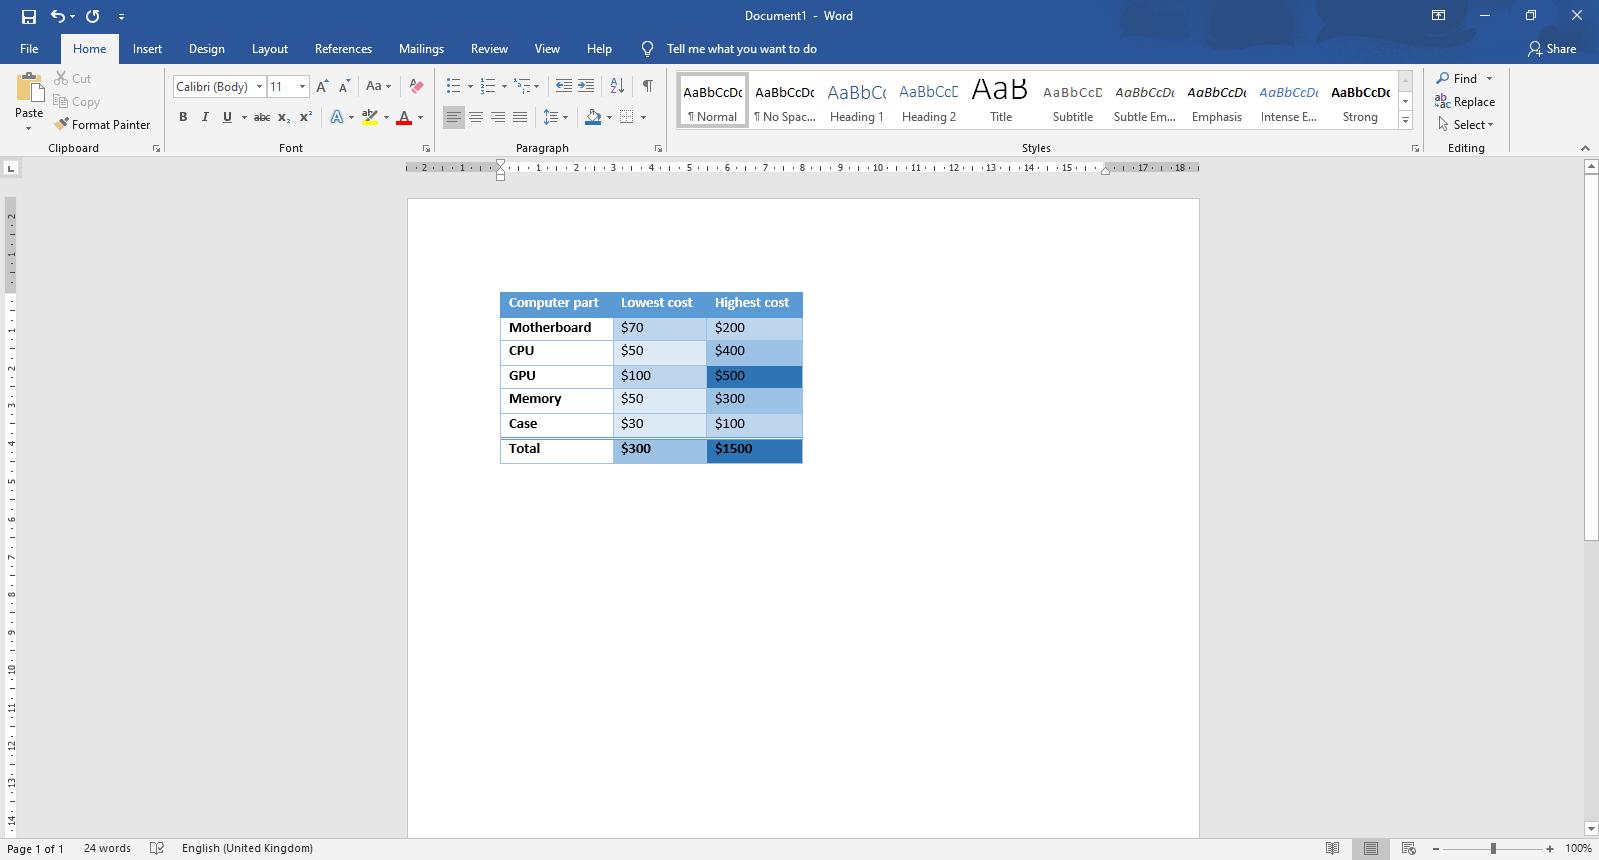 Microsoft Word에서 표를 추가하고 사용자 지정하는 방법